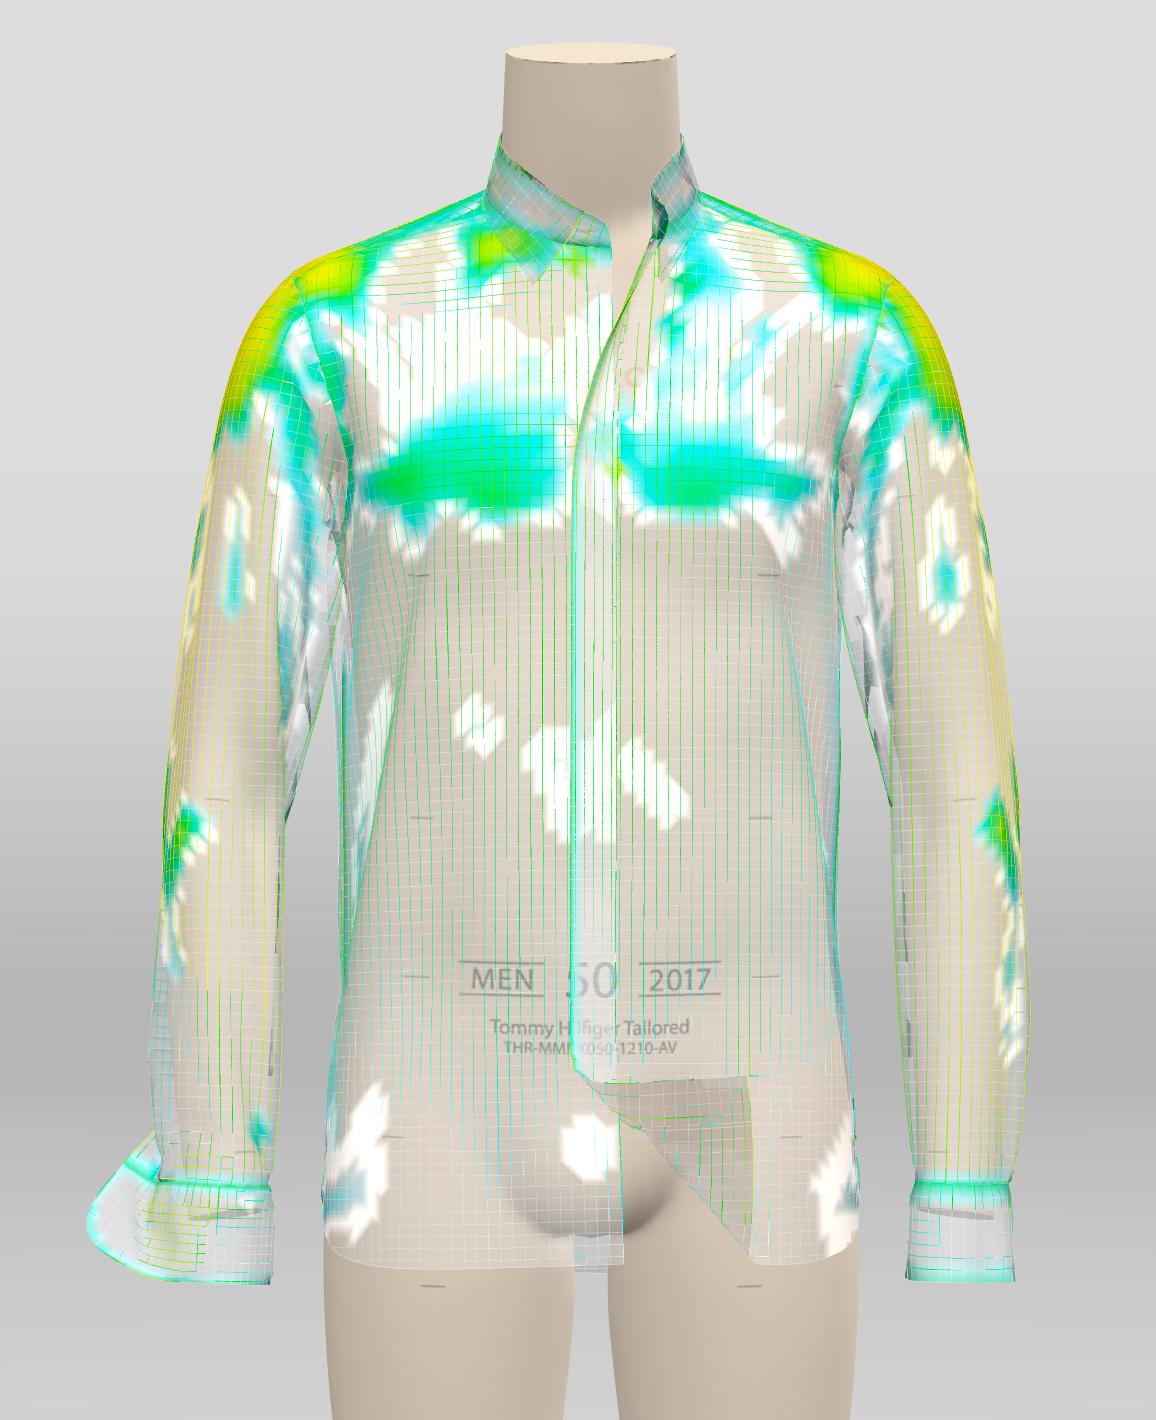 Tommy Hilfiger: Pressure Map on Garment